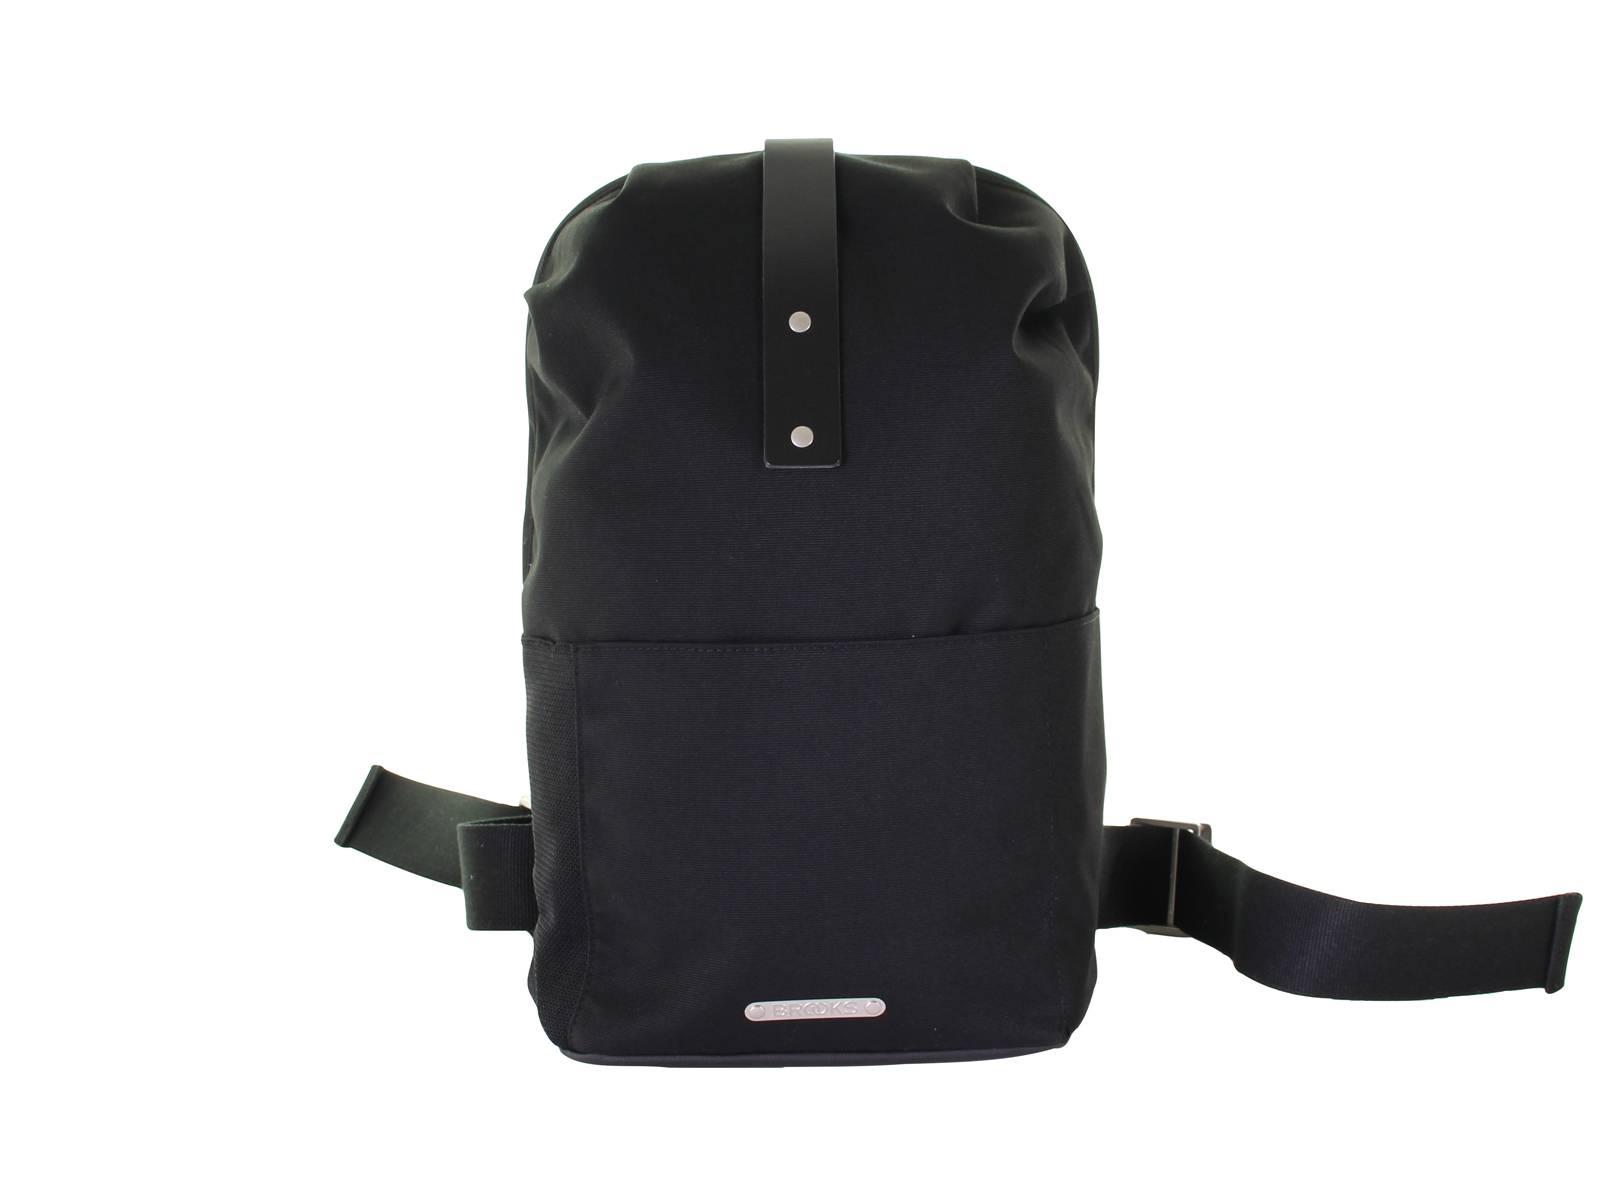 brooks fahrradtasche rucksack dalston s schwarz. Black Bedroom Furniture Sets. Home Design Ideas